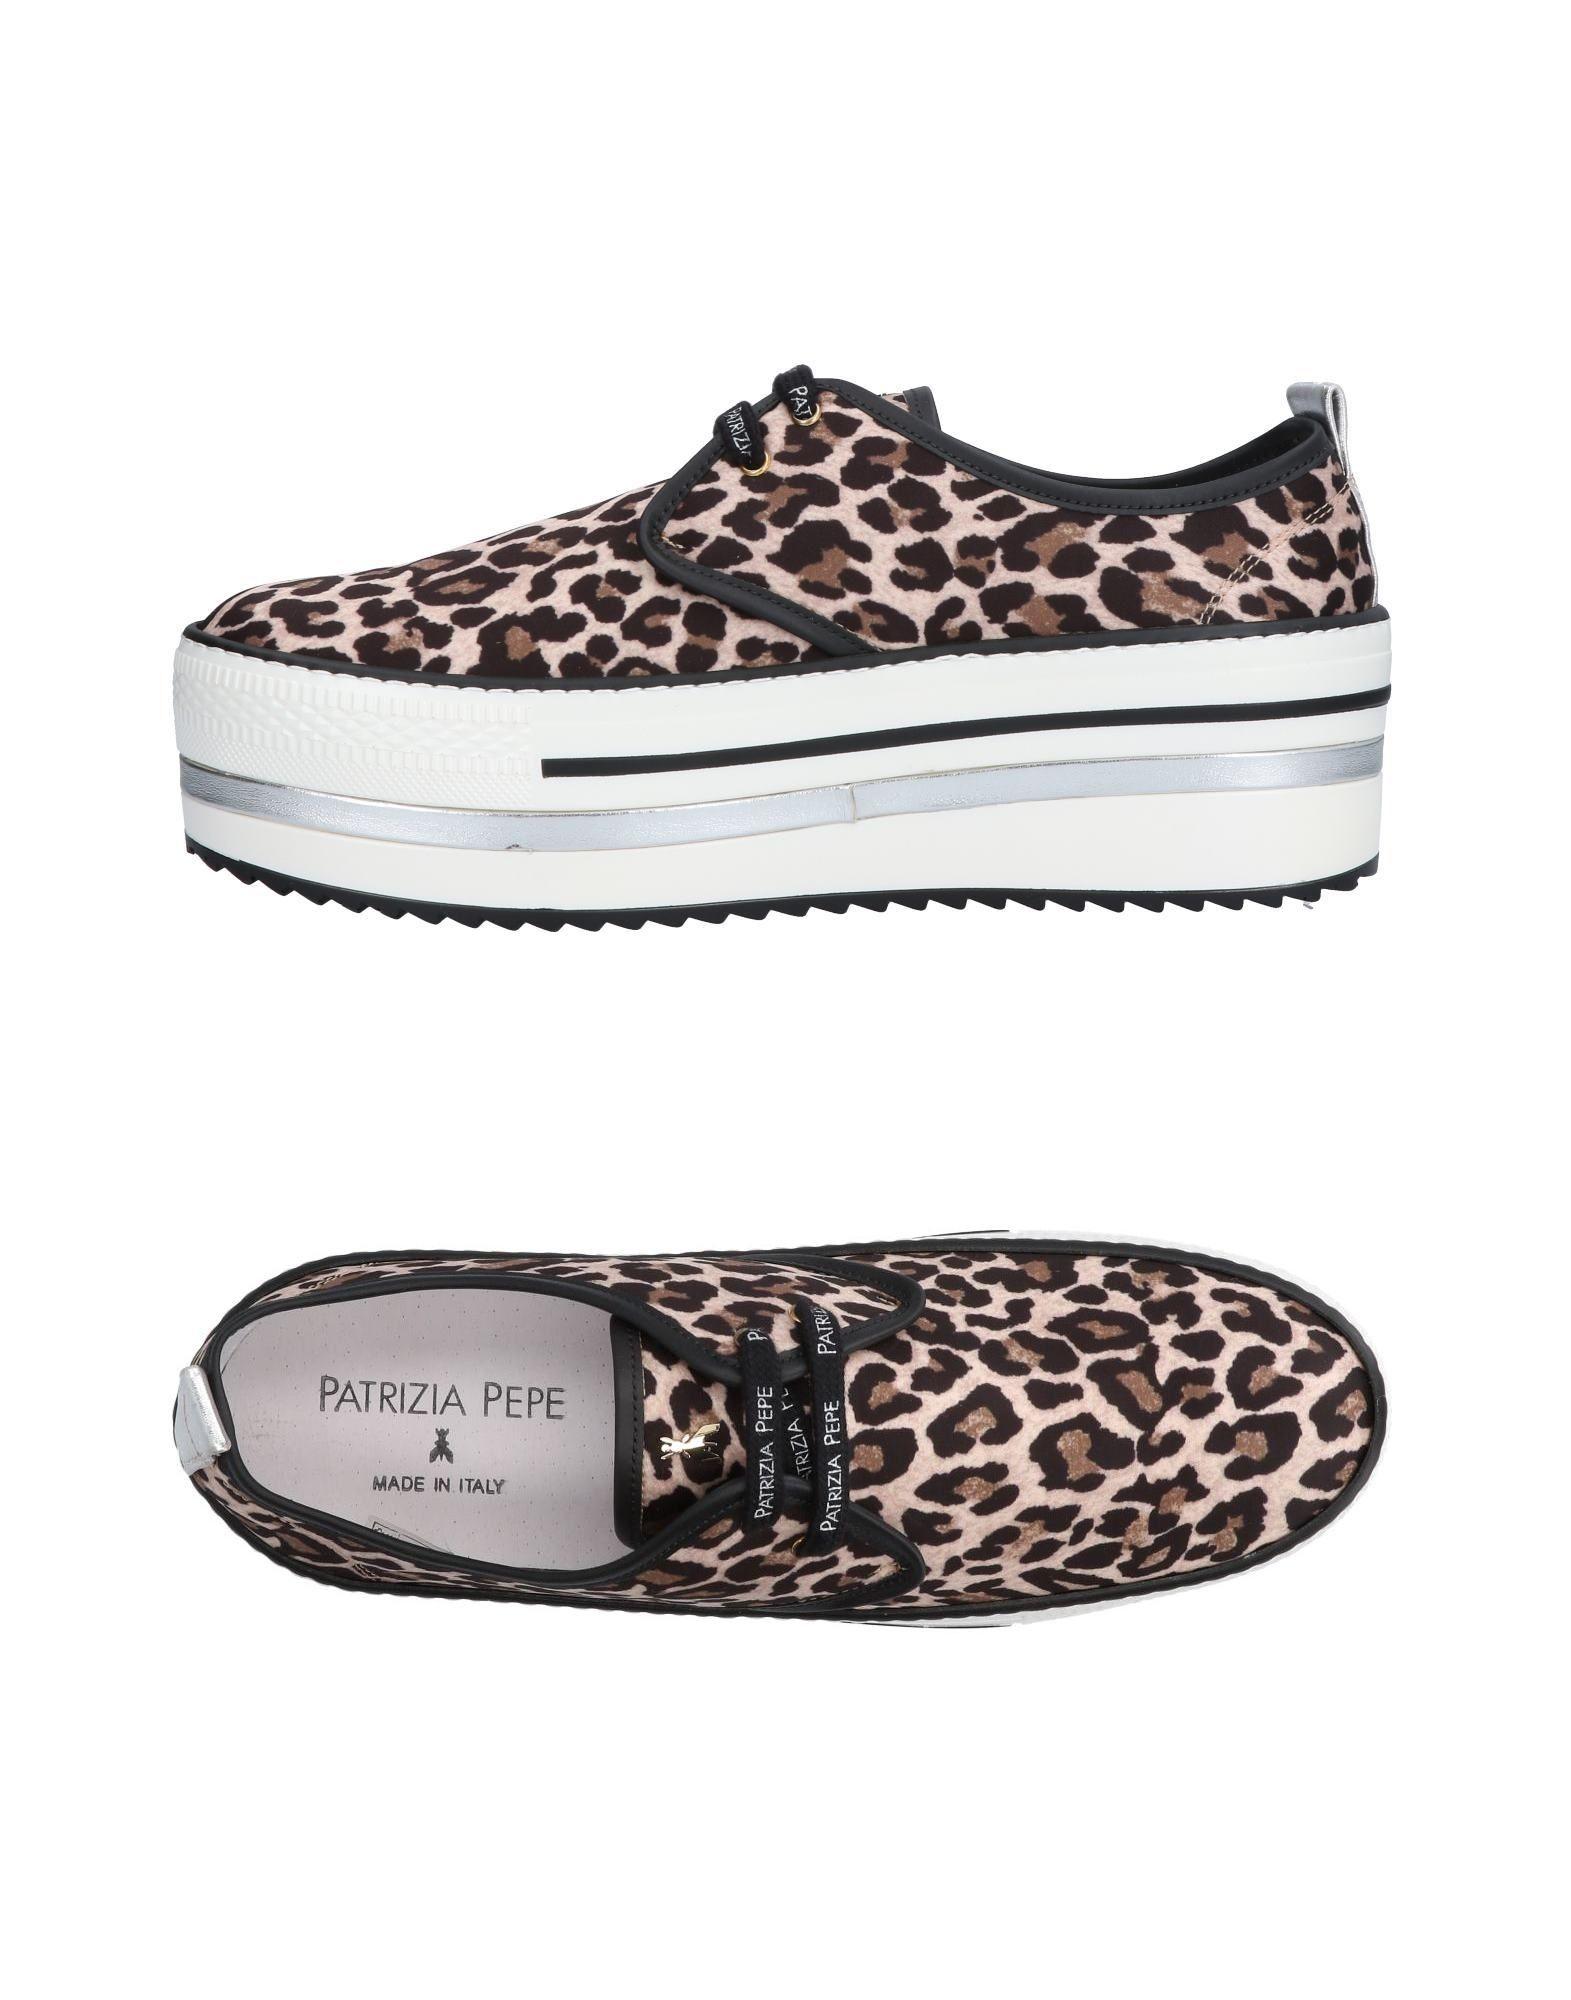 Patrizia 11444176QK Pepe Sneakers Damen  11444176QK Patrizia Gute Qualität beliebte Schuhe d1bb9d